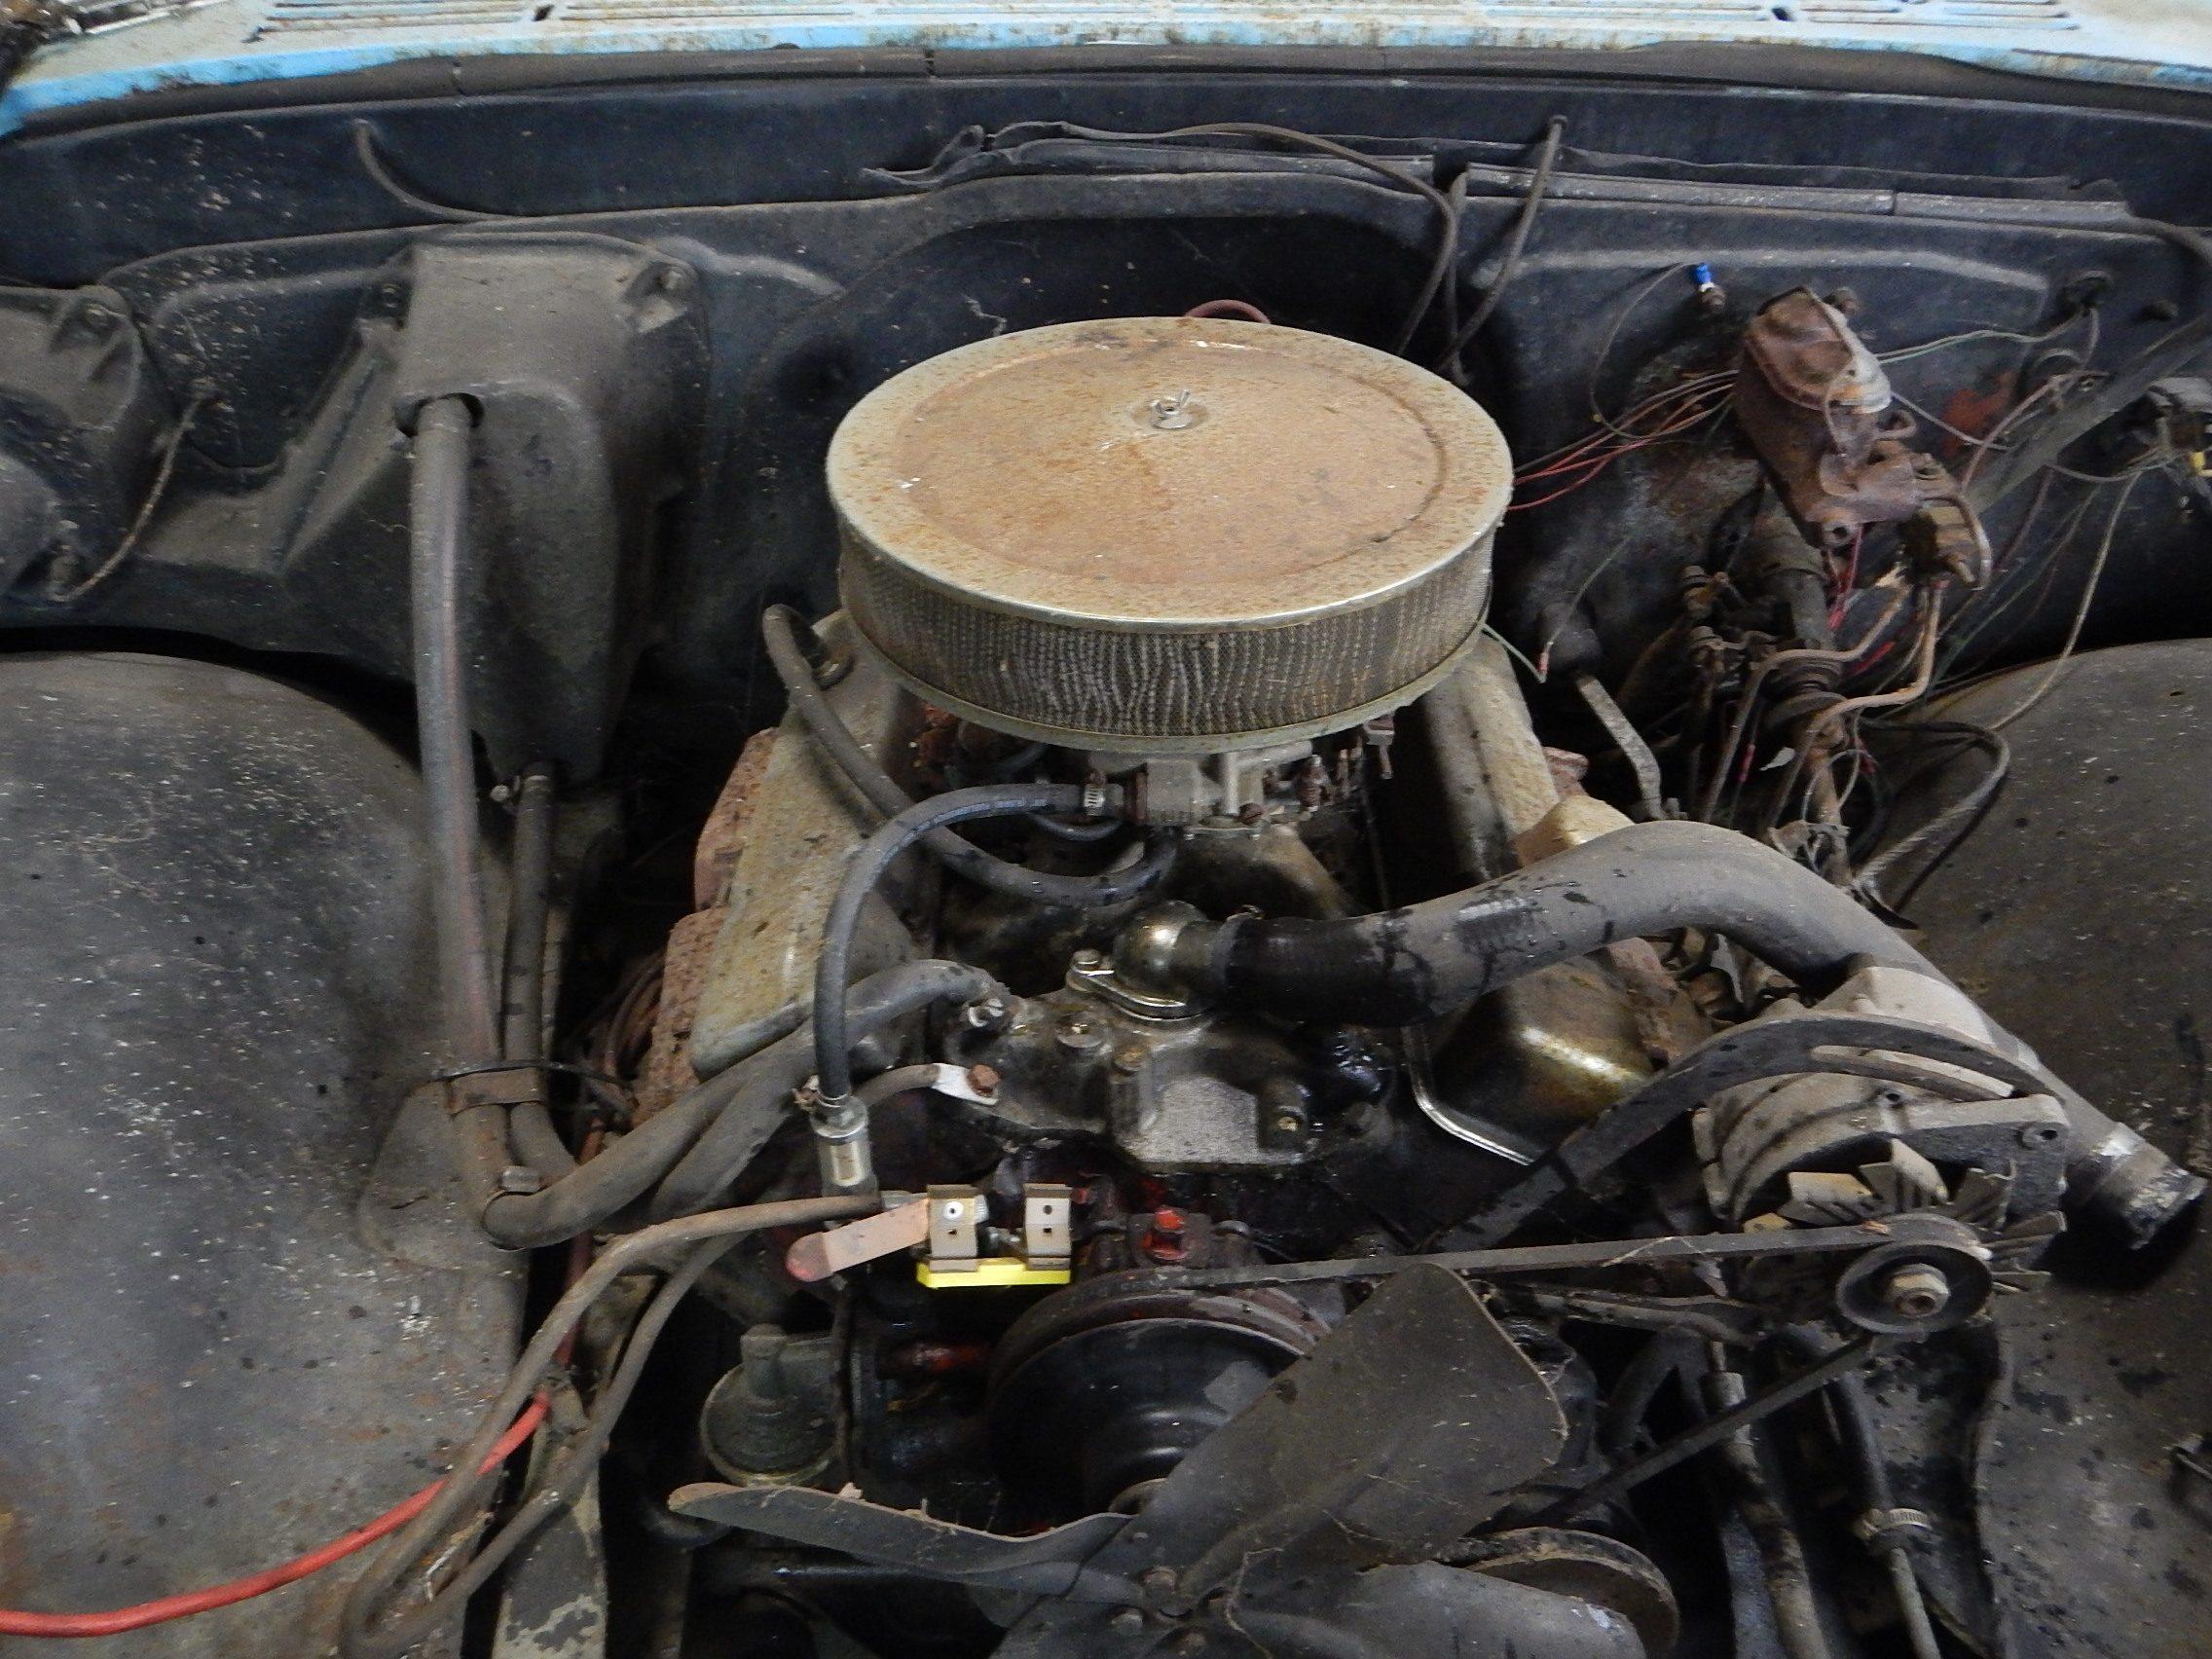 1967 Chevy C-10 restoration 16.jpg